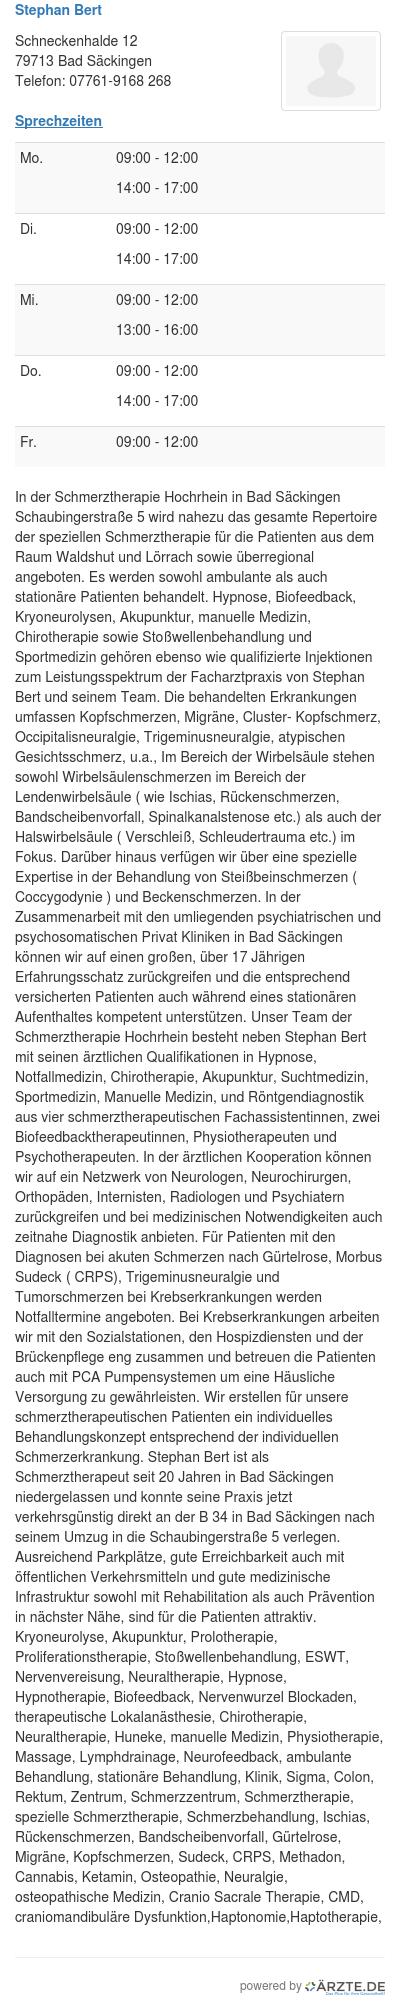 Stephan bert